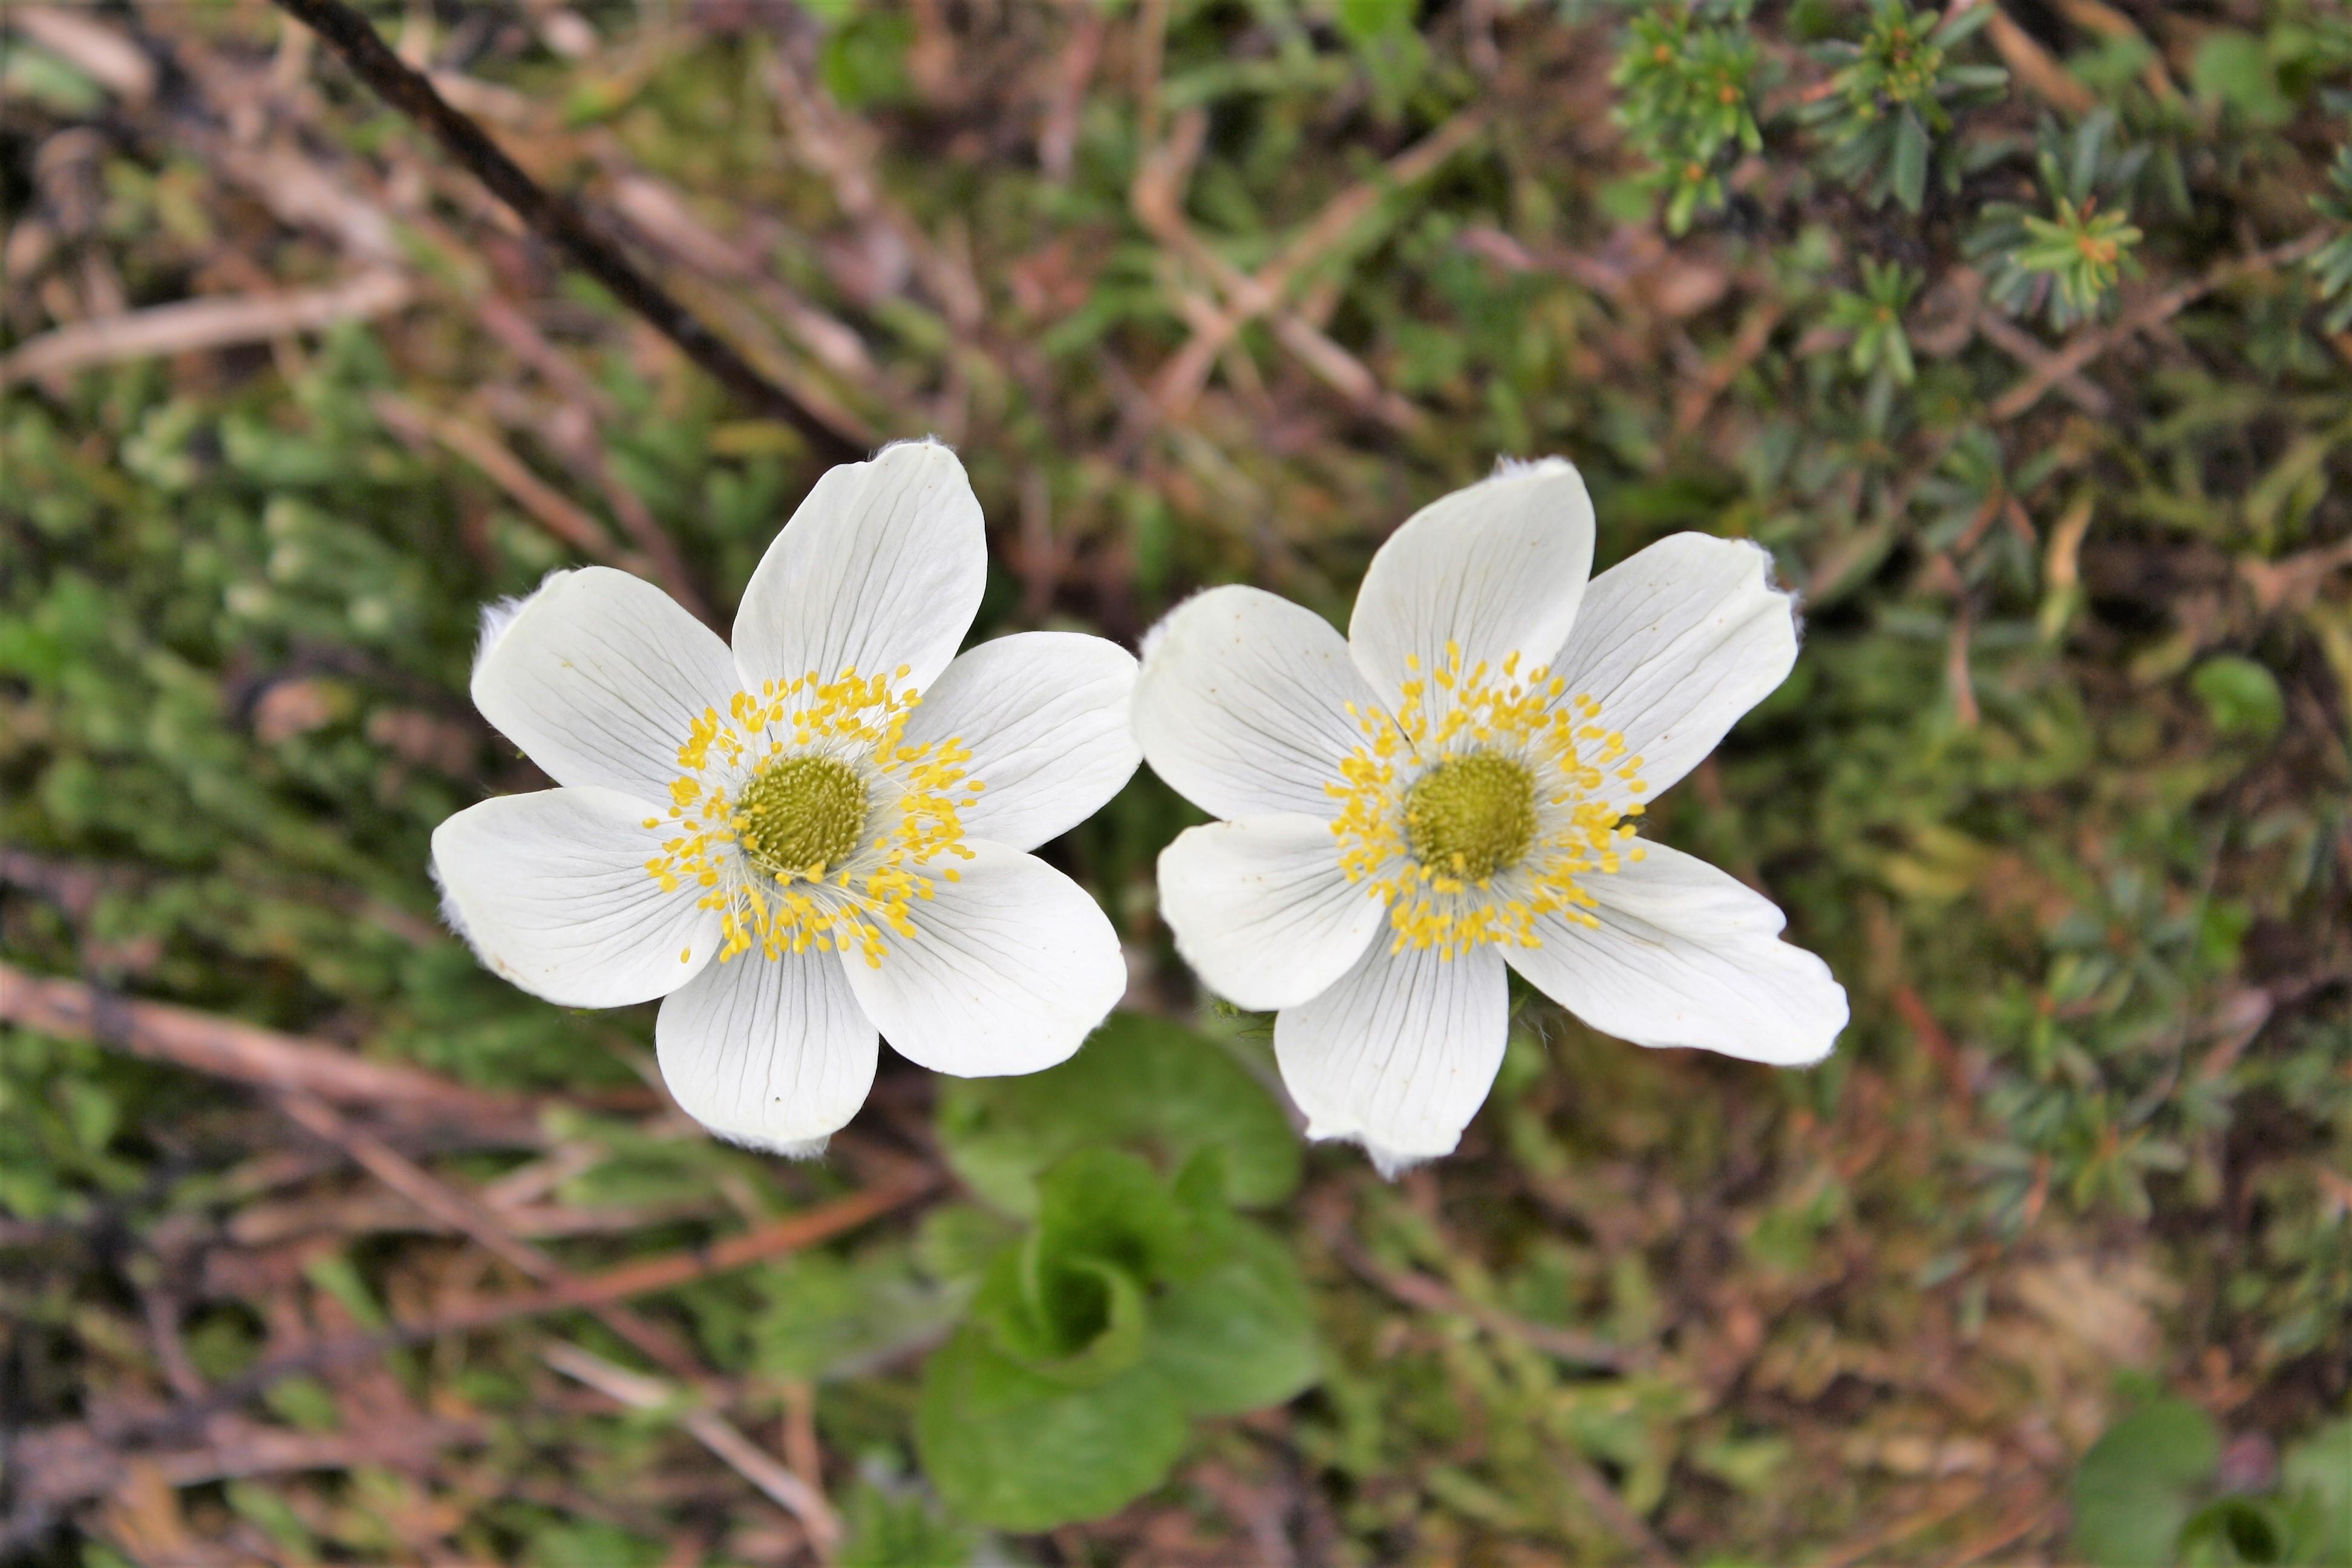 DM_nature_foliage_352